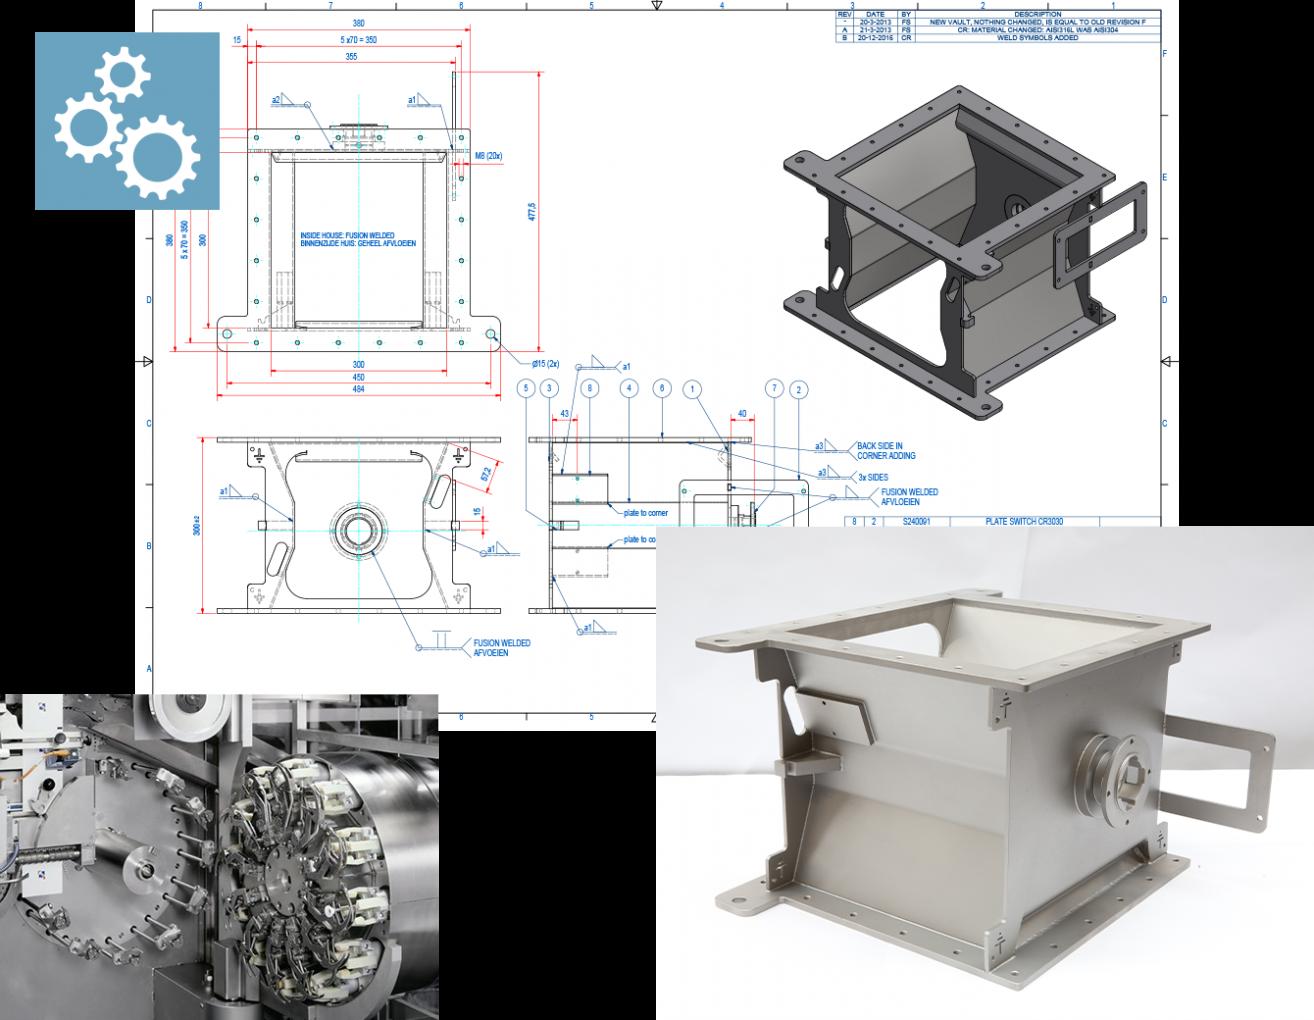 Branches Machinebouw V1